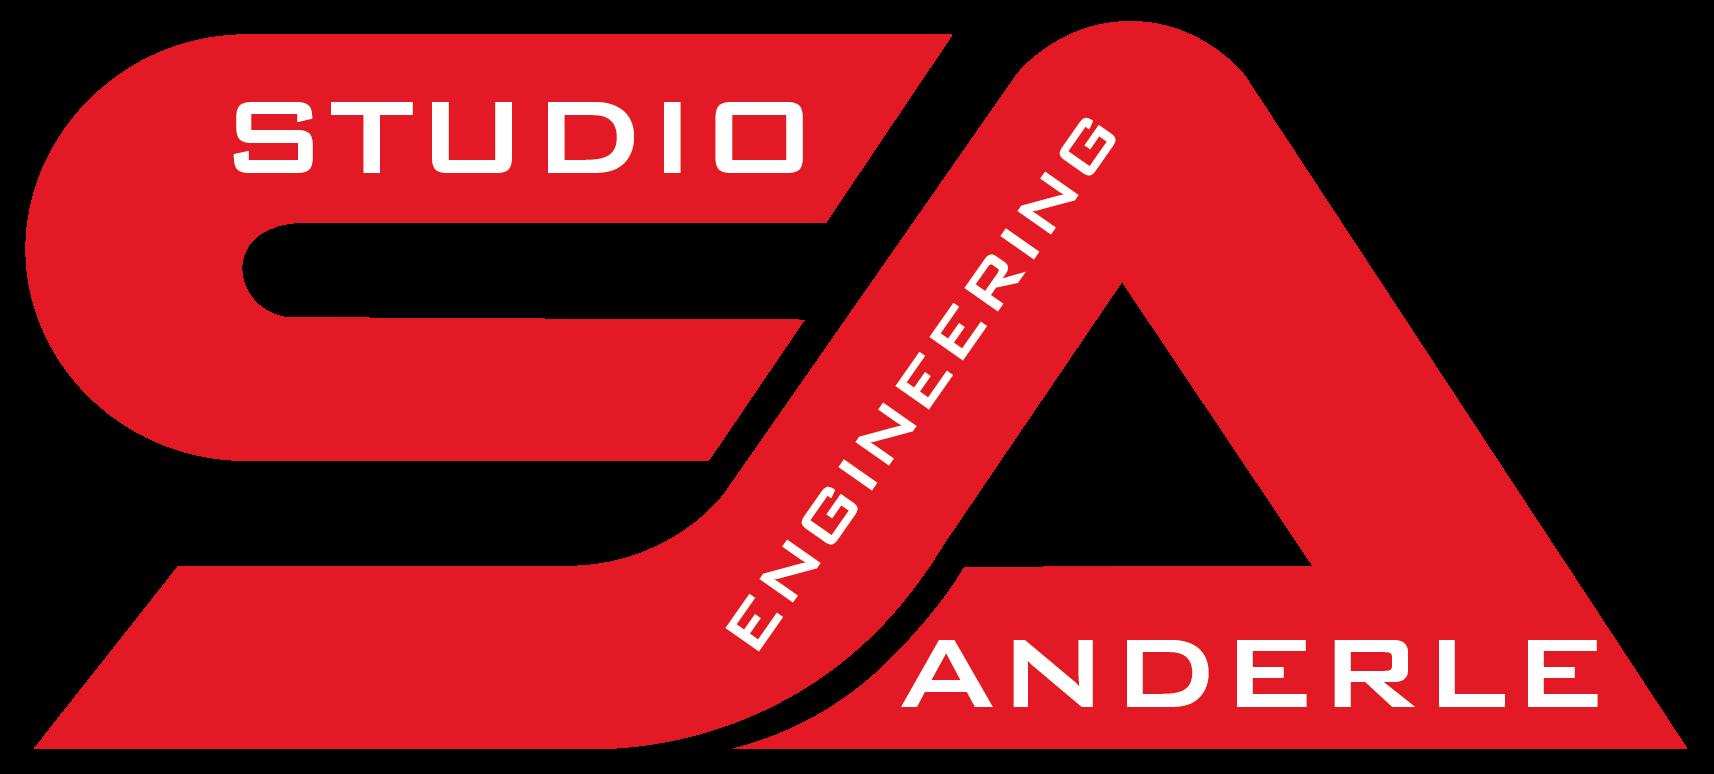 Studio Anderle